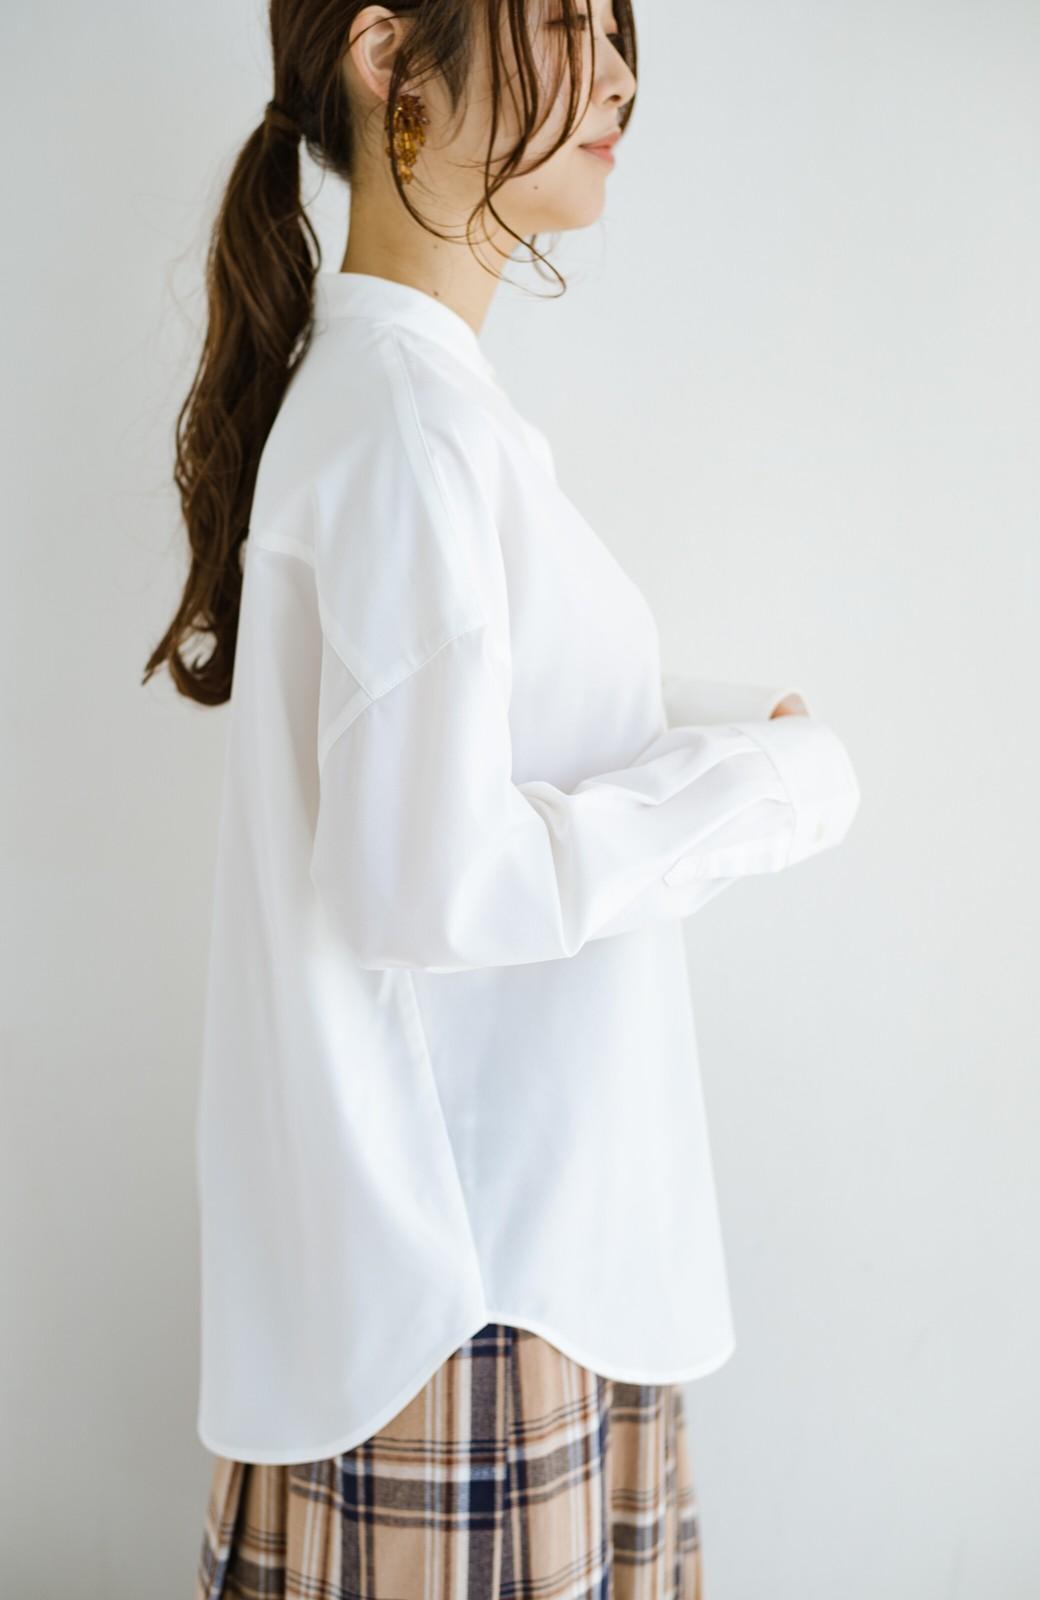 haco! 【肩幅党】肩幅広めがなんのその!華奢見せをとことん追求した重ね着にも便利なスタンドカラーシャツ <ホワイト>の商品写真8